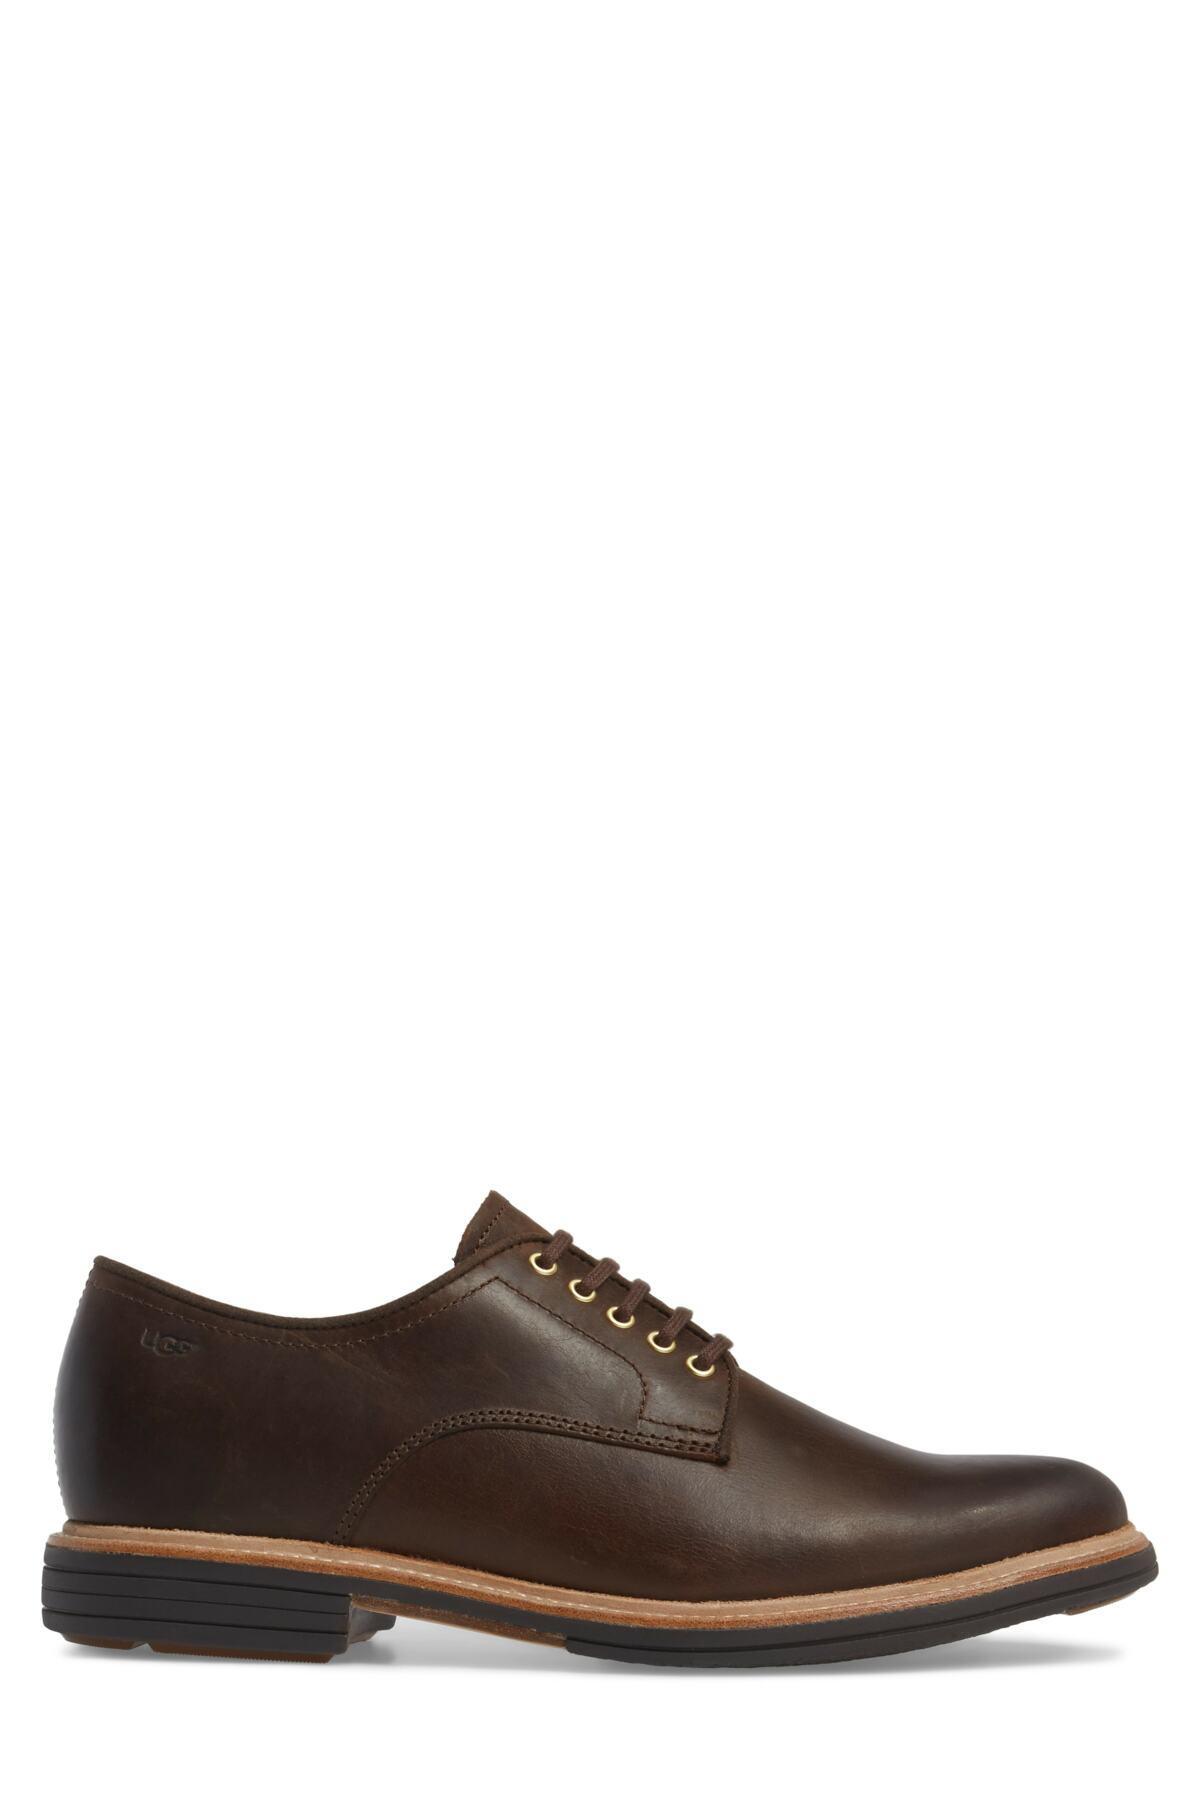 0087b1336cc Ugg Brown Jovin Buck Shoe for men